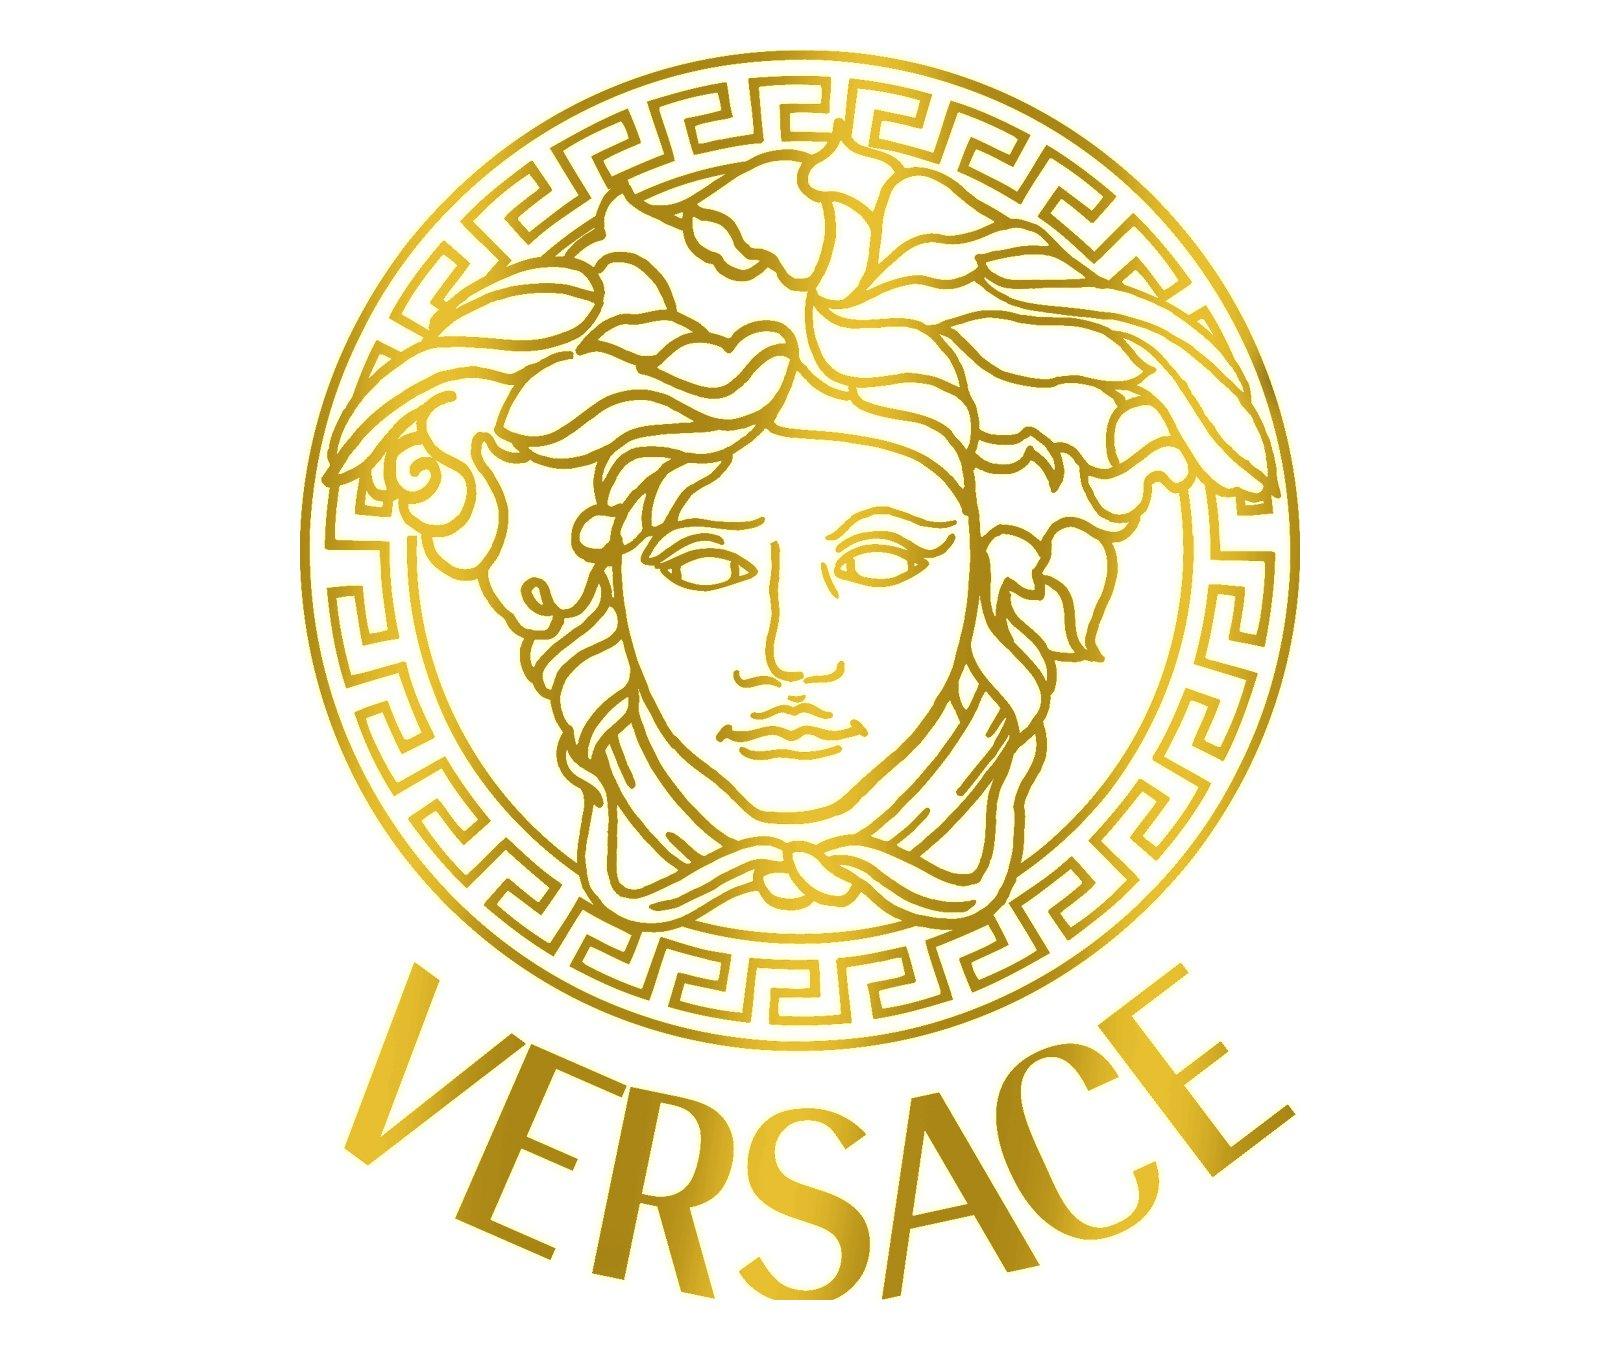 Sticker Wallpaper Versace Logo Tous Les Logos